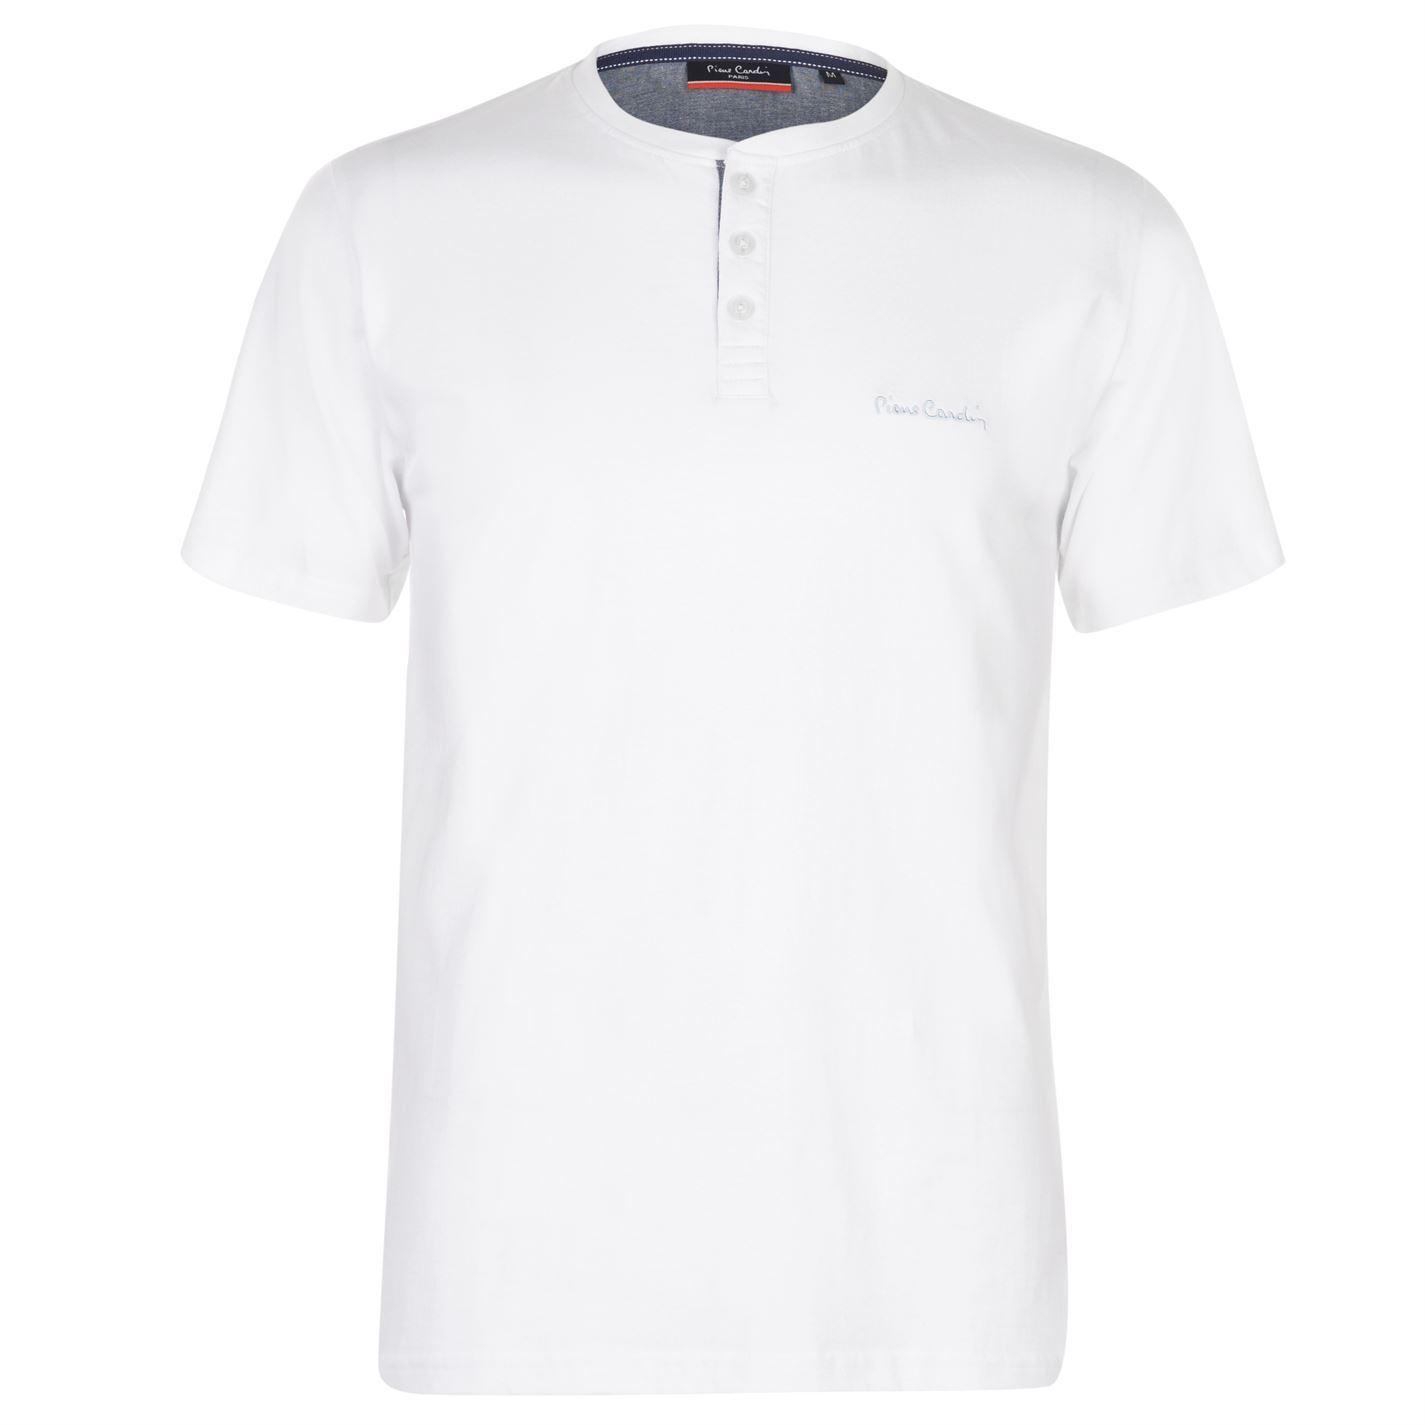 eba1806a ... Pierre Cardin Contrast Henley T-Shirt Mens White Tee Shirt Tshirt Top  ...